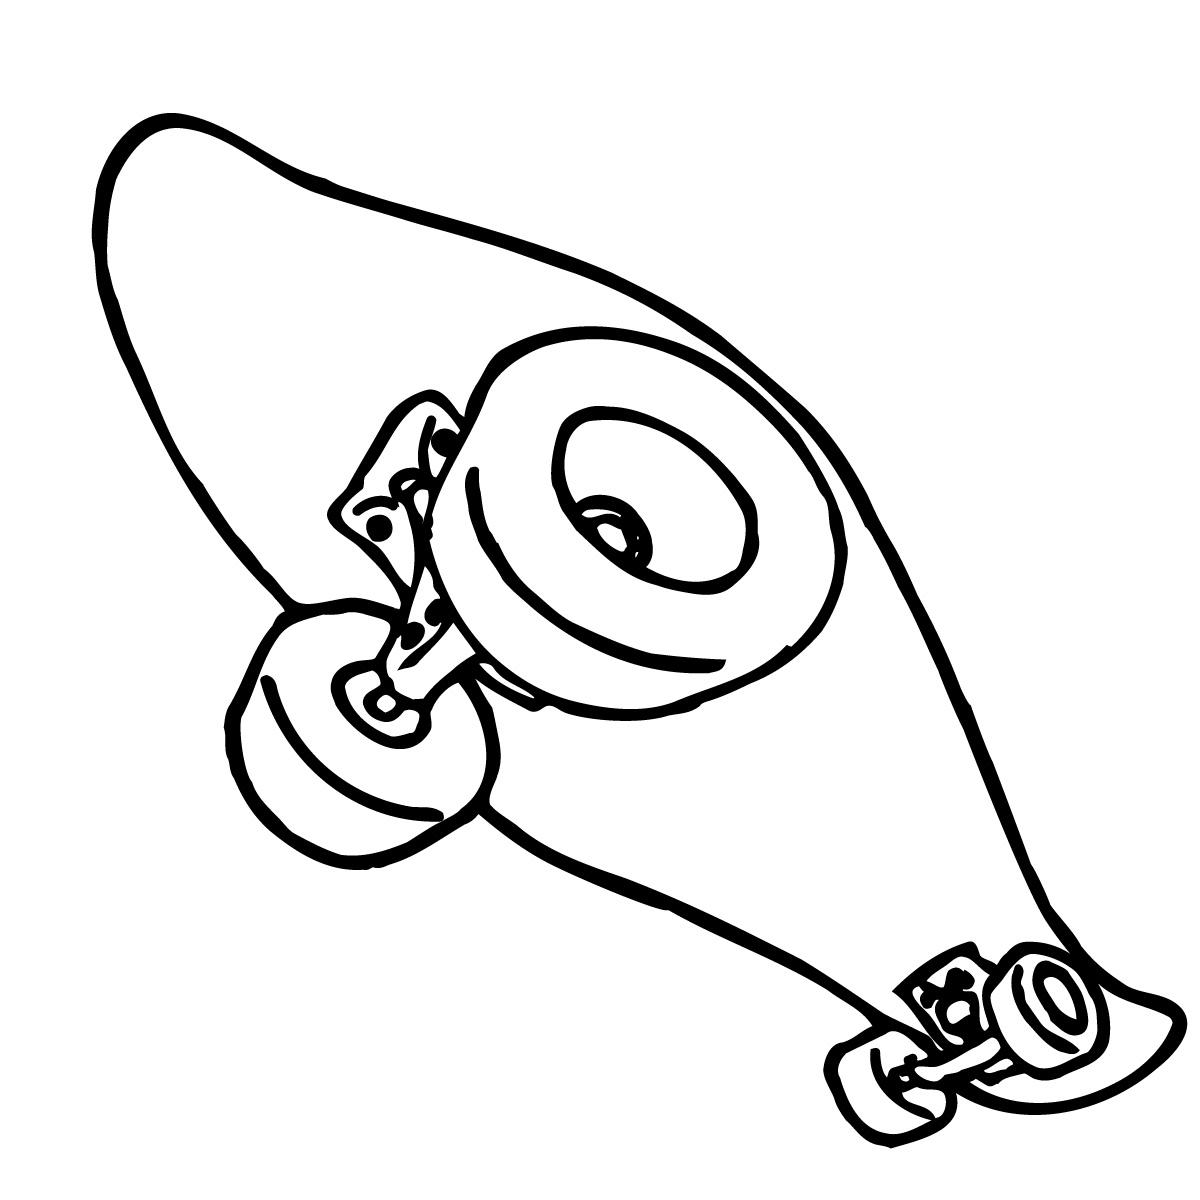 Skateboard clip art 3